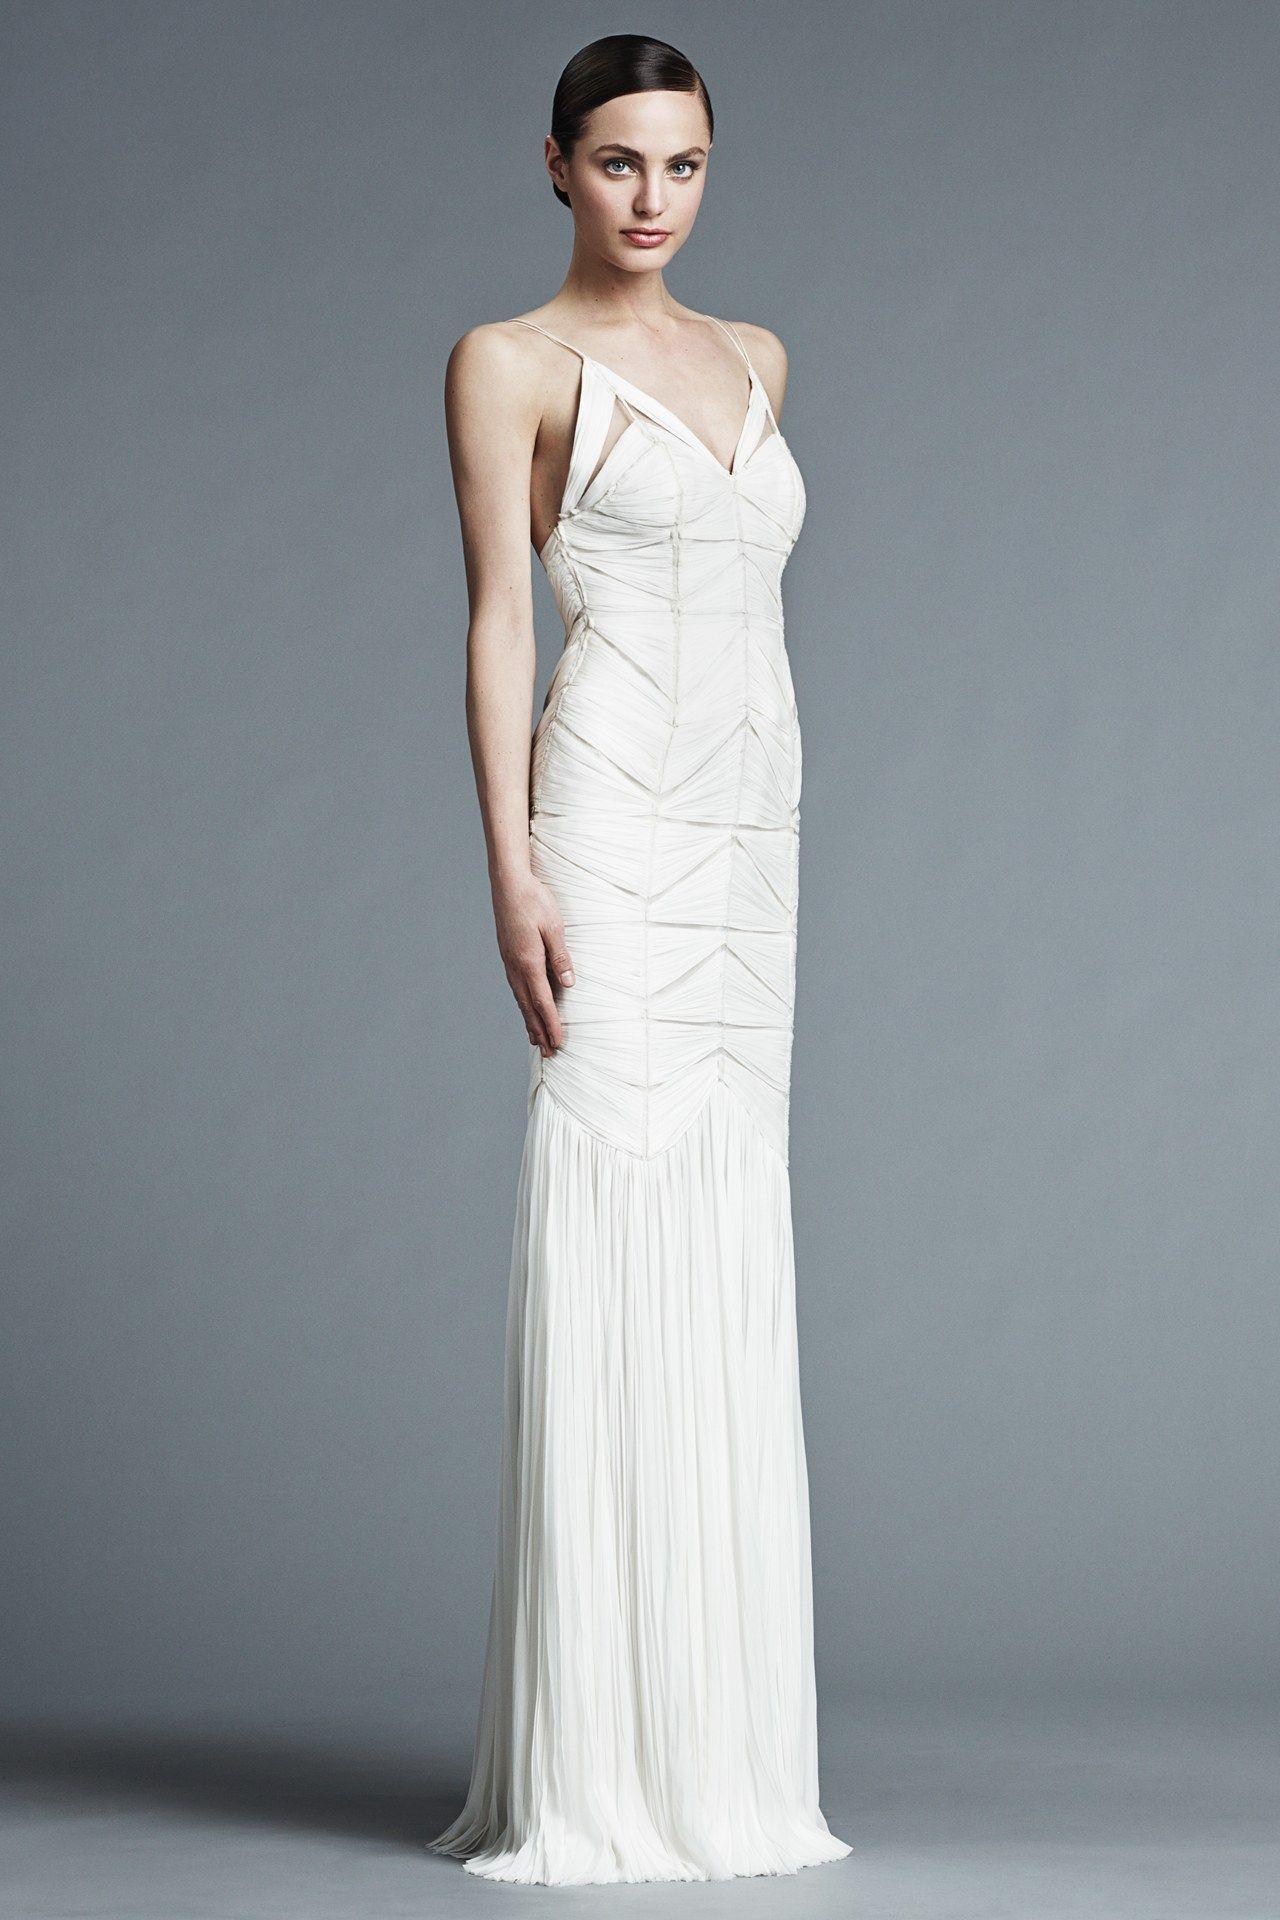 J. Mendel Spring 2015 Bridal Collection | Bridal Gown--Unique Gown ...